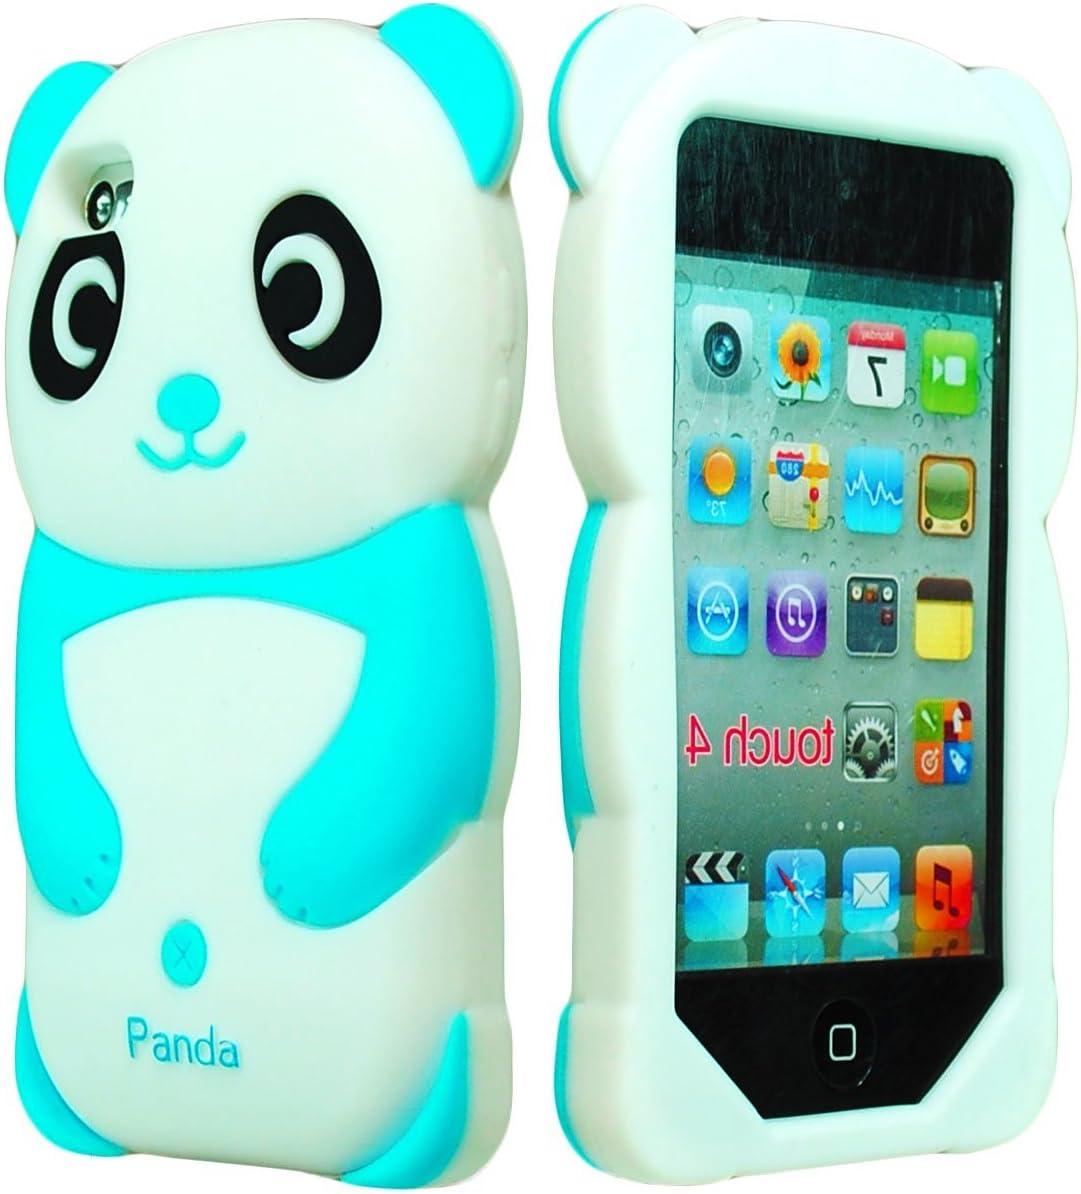 iPod Ultra-Cheap Deals Touch 4 Case Bastex 3D Sky Bea White Panda Silicone Max 84% OFF Blue